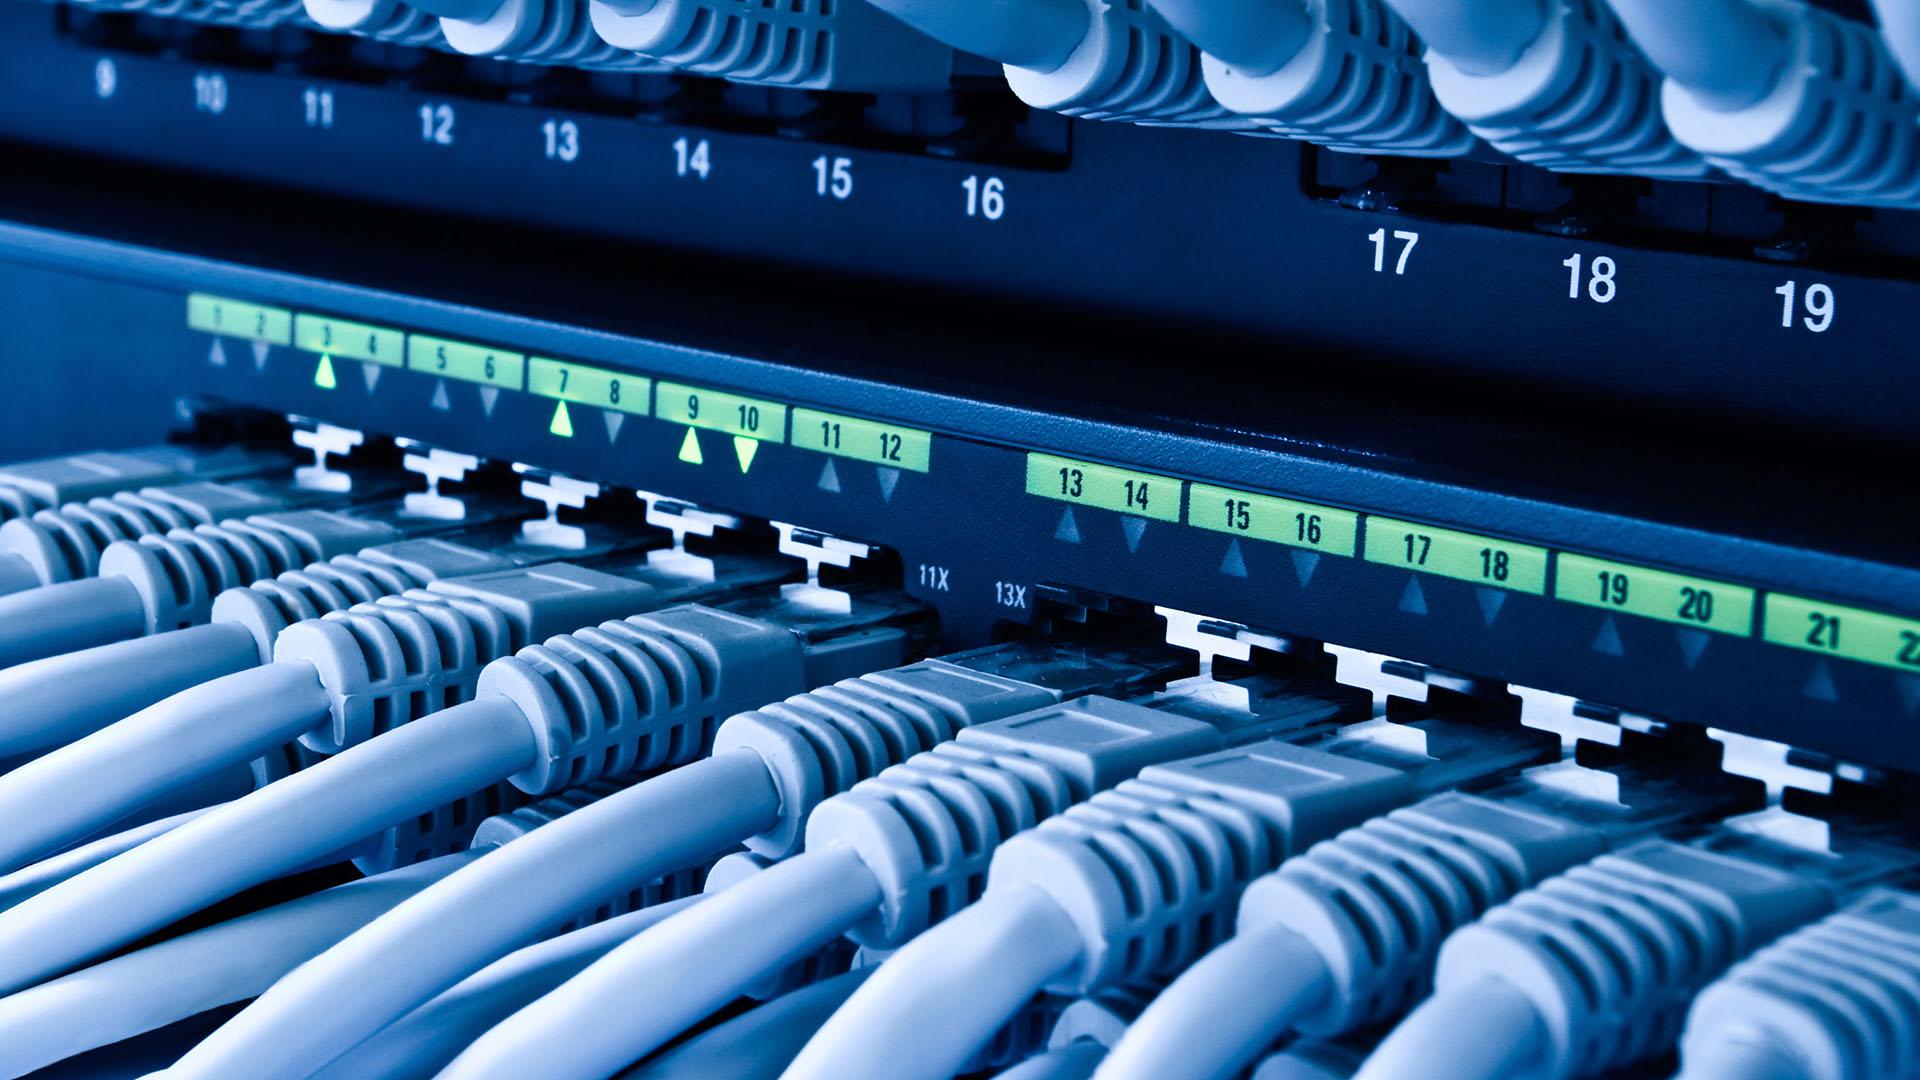 Nicholasville Kentucky Top Voice & Data Network Cabling Contractor